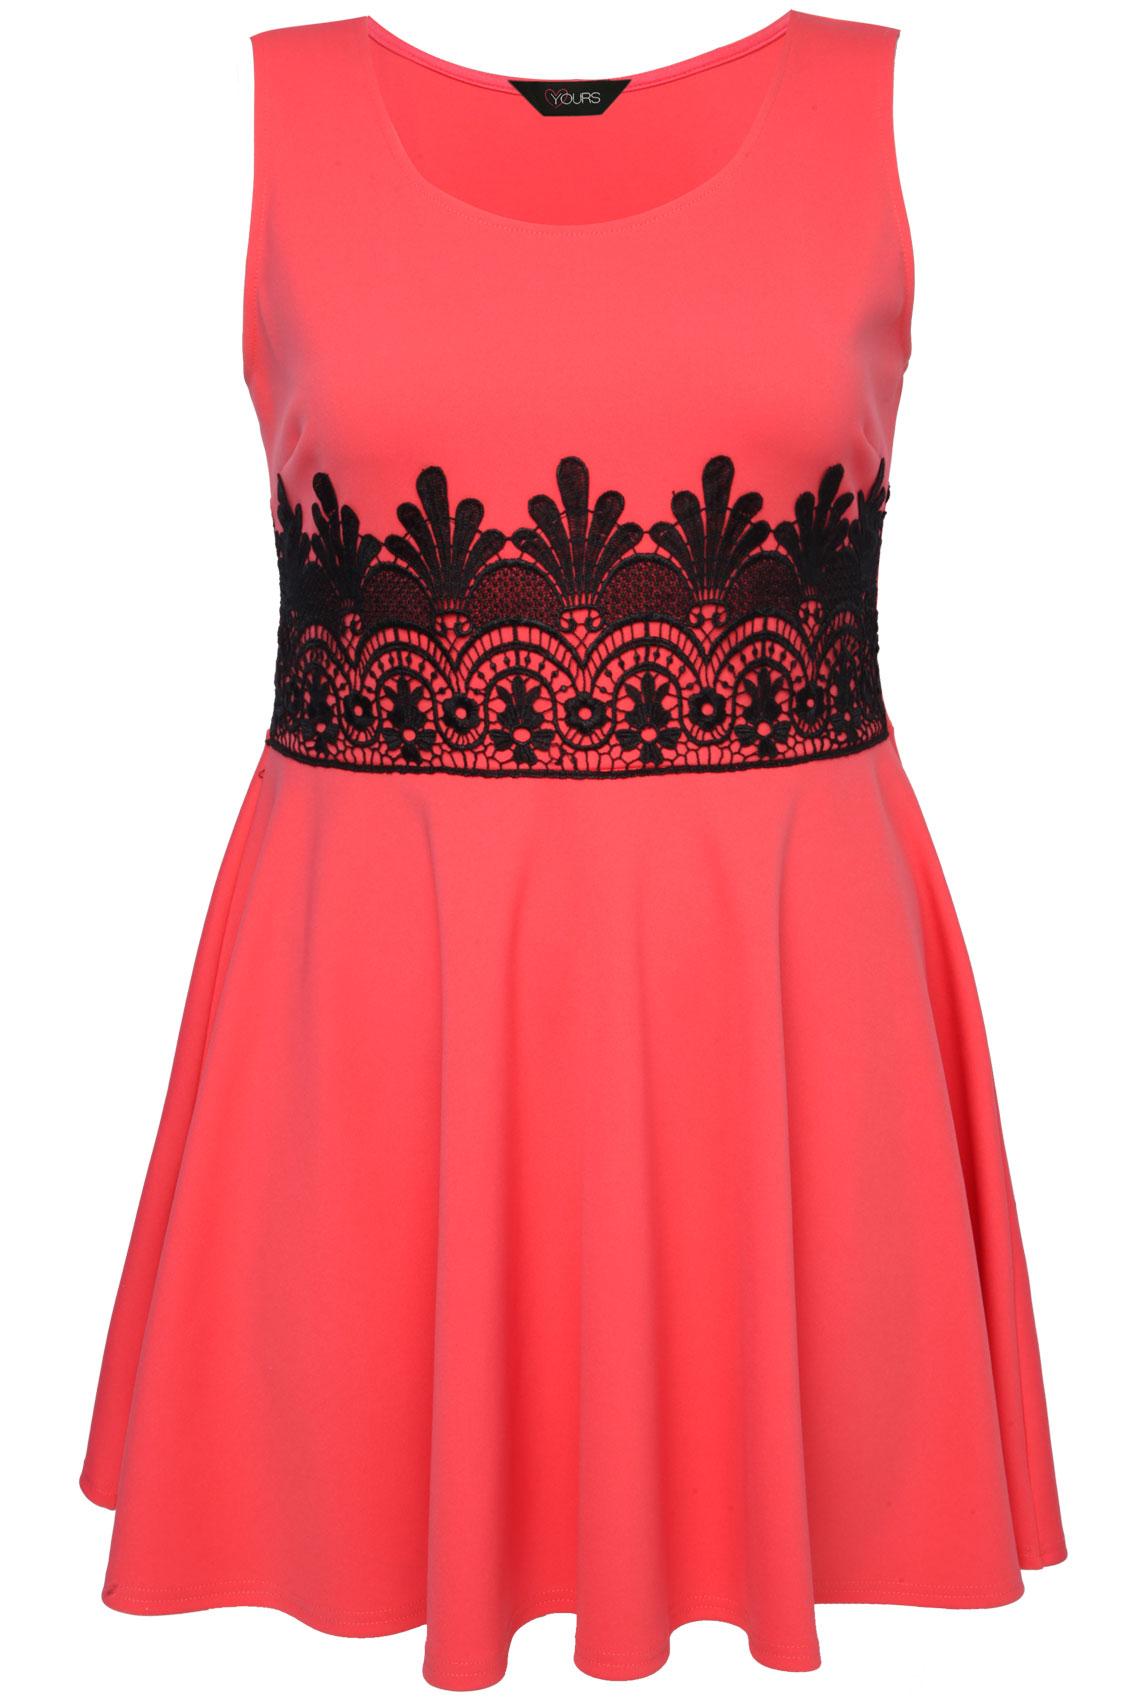 Pink Dress Size 18